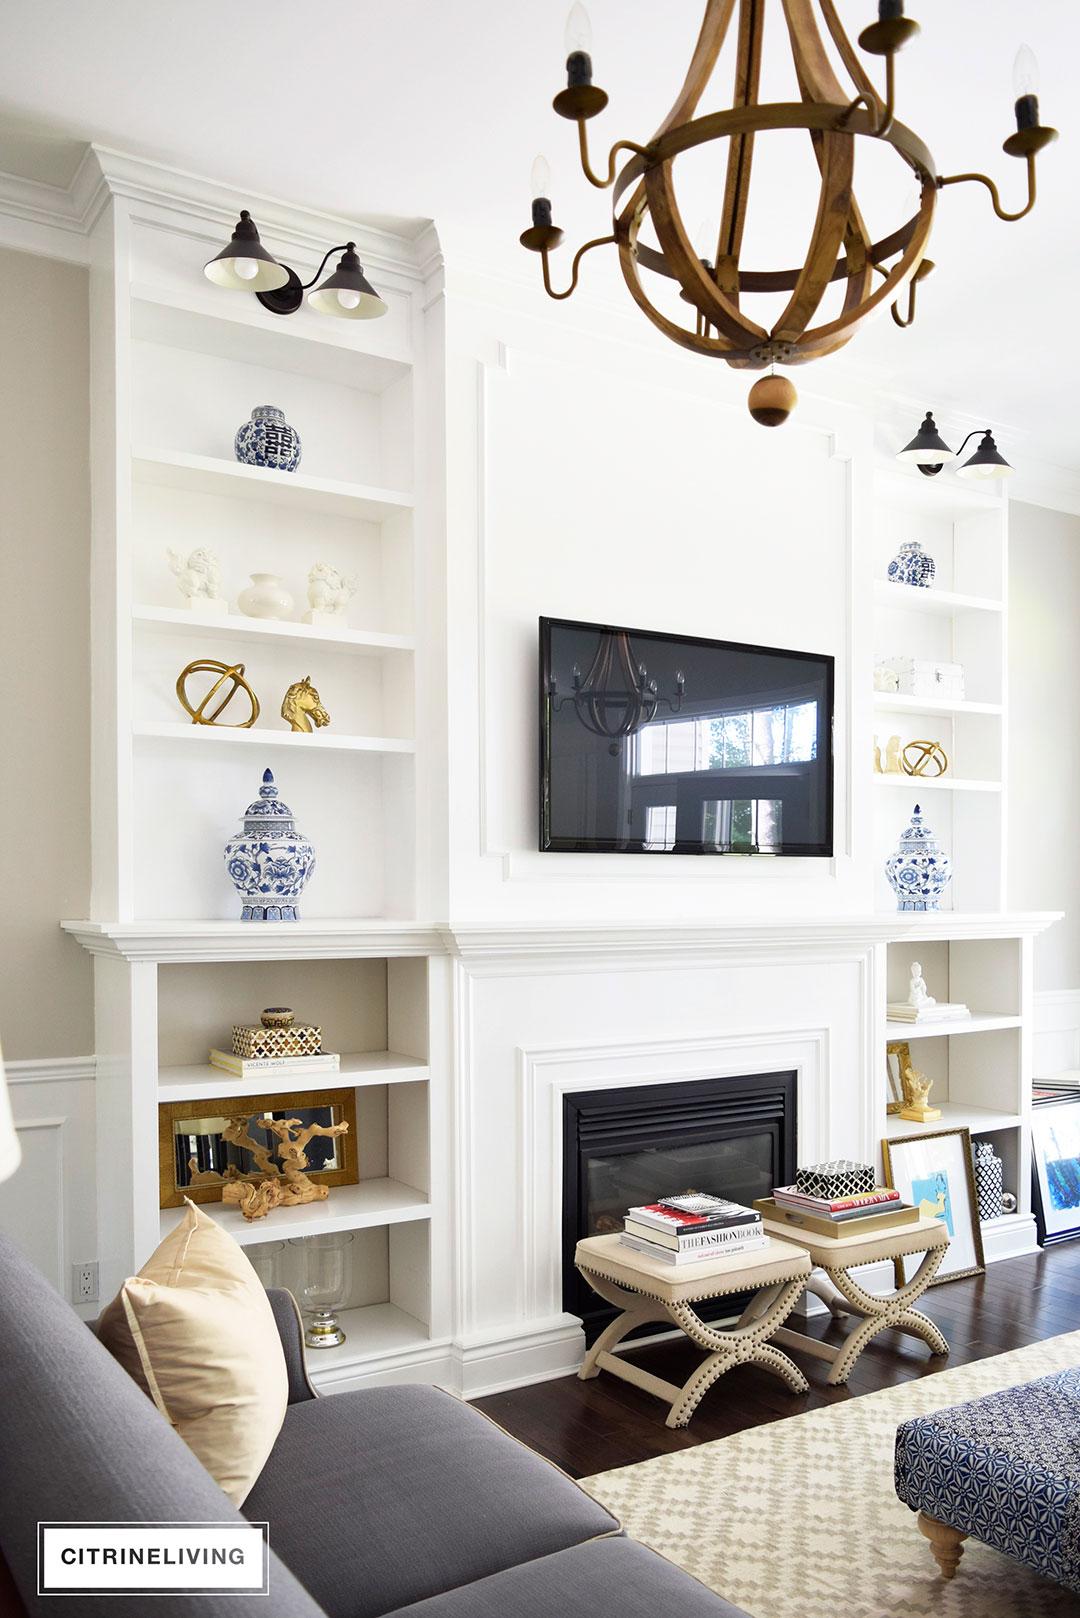 diy shelves in living room traditional rooms images citrineliving bookshelves ceiling height built bookshelves6